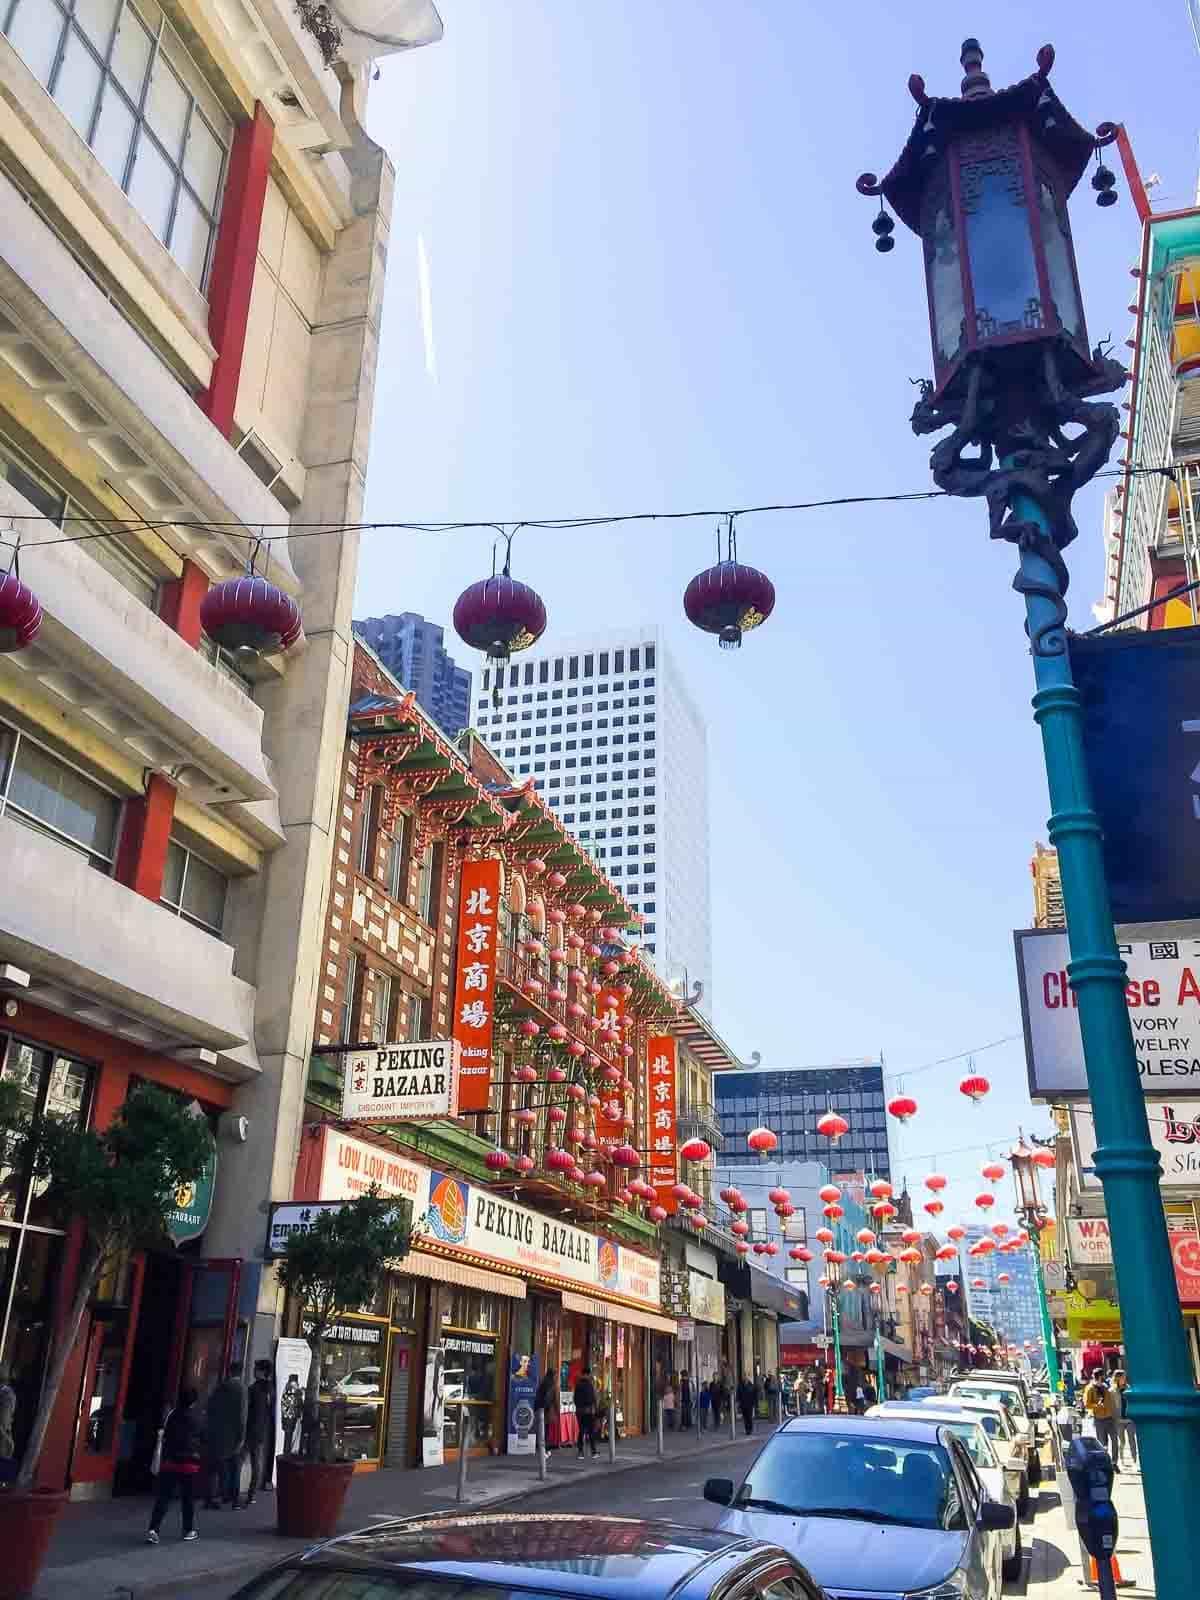 San Francisco Chinatown. A great activity in San Francisco!